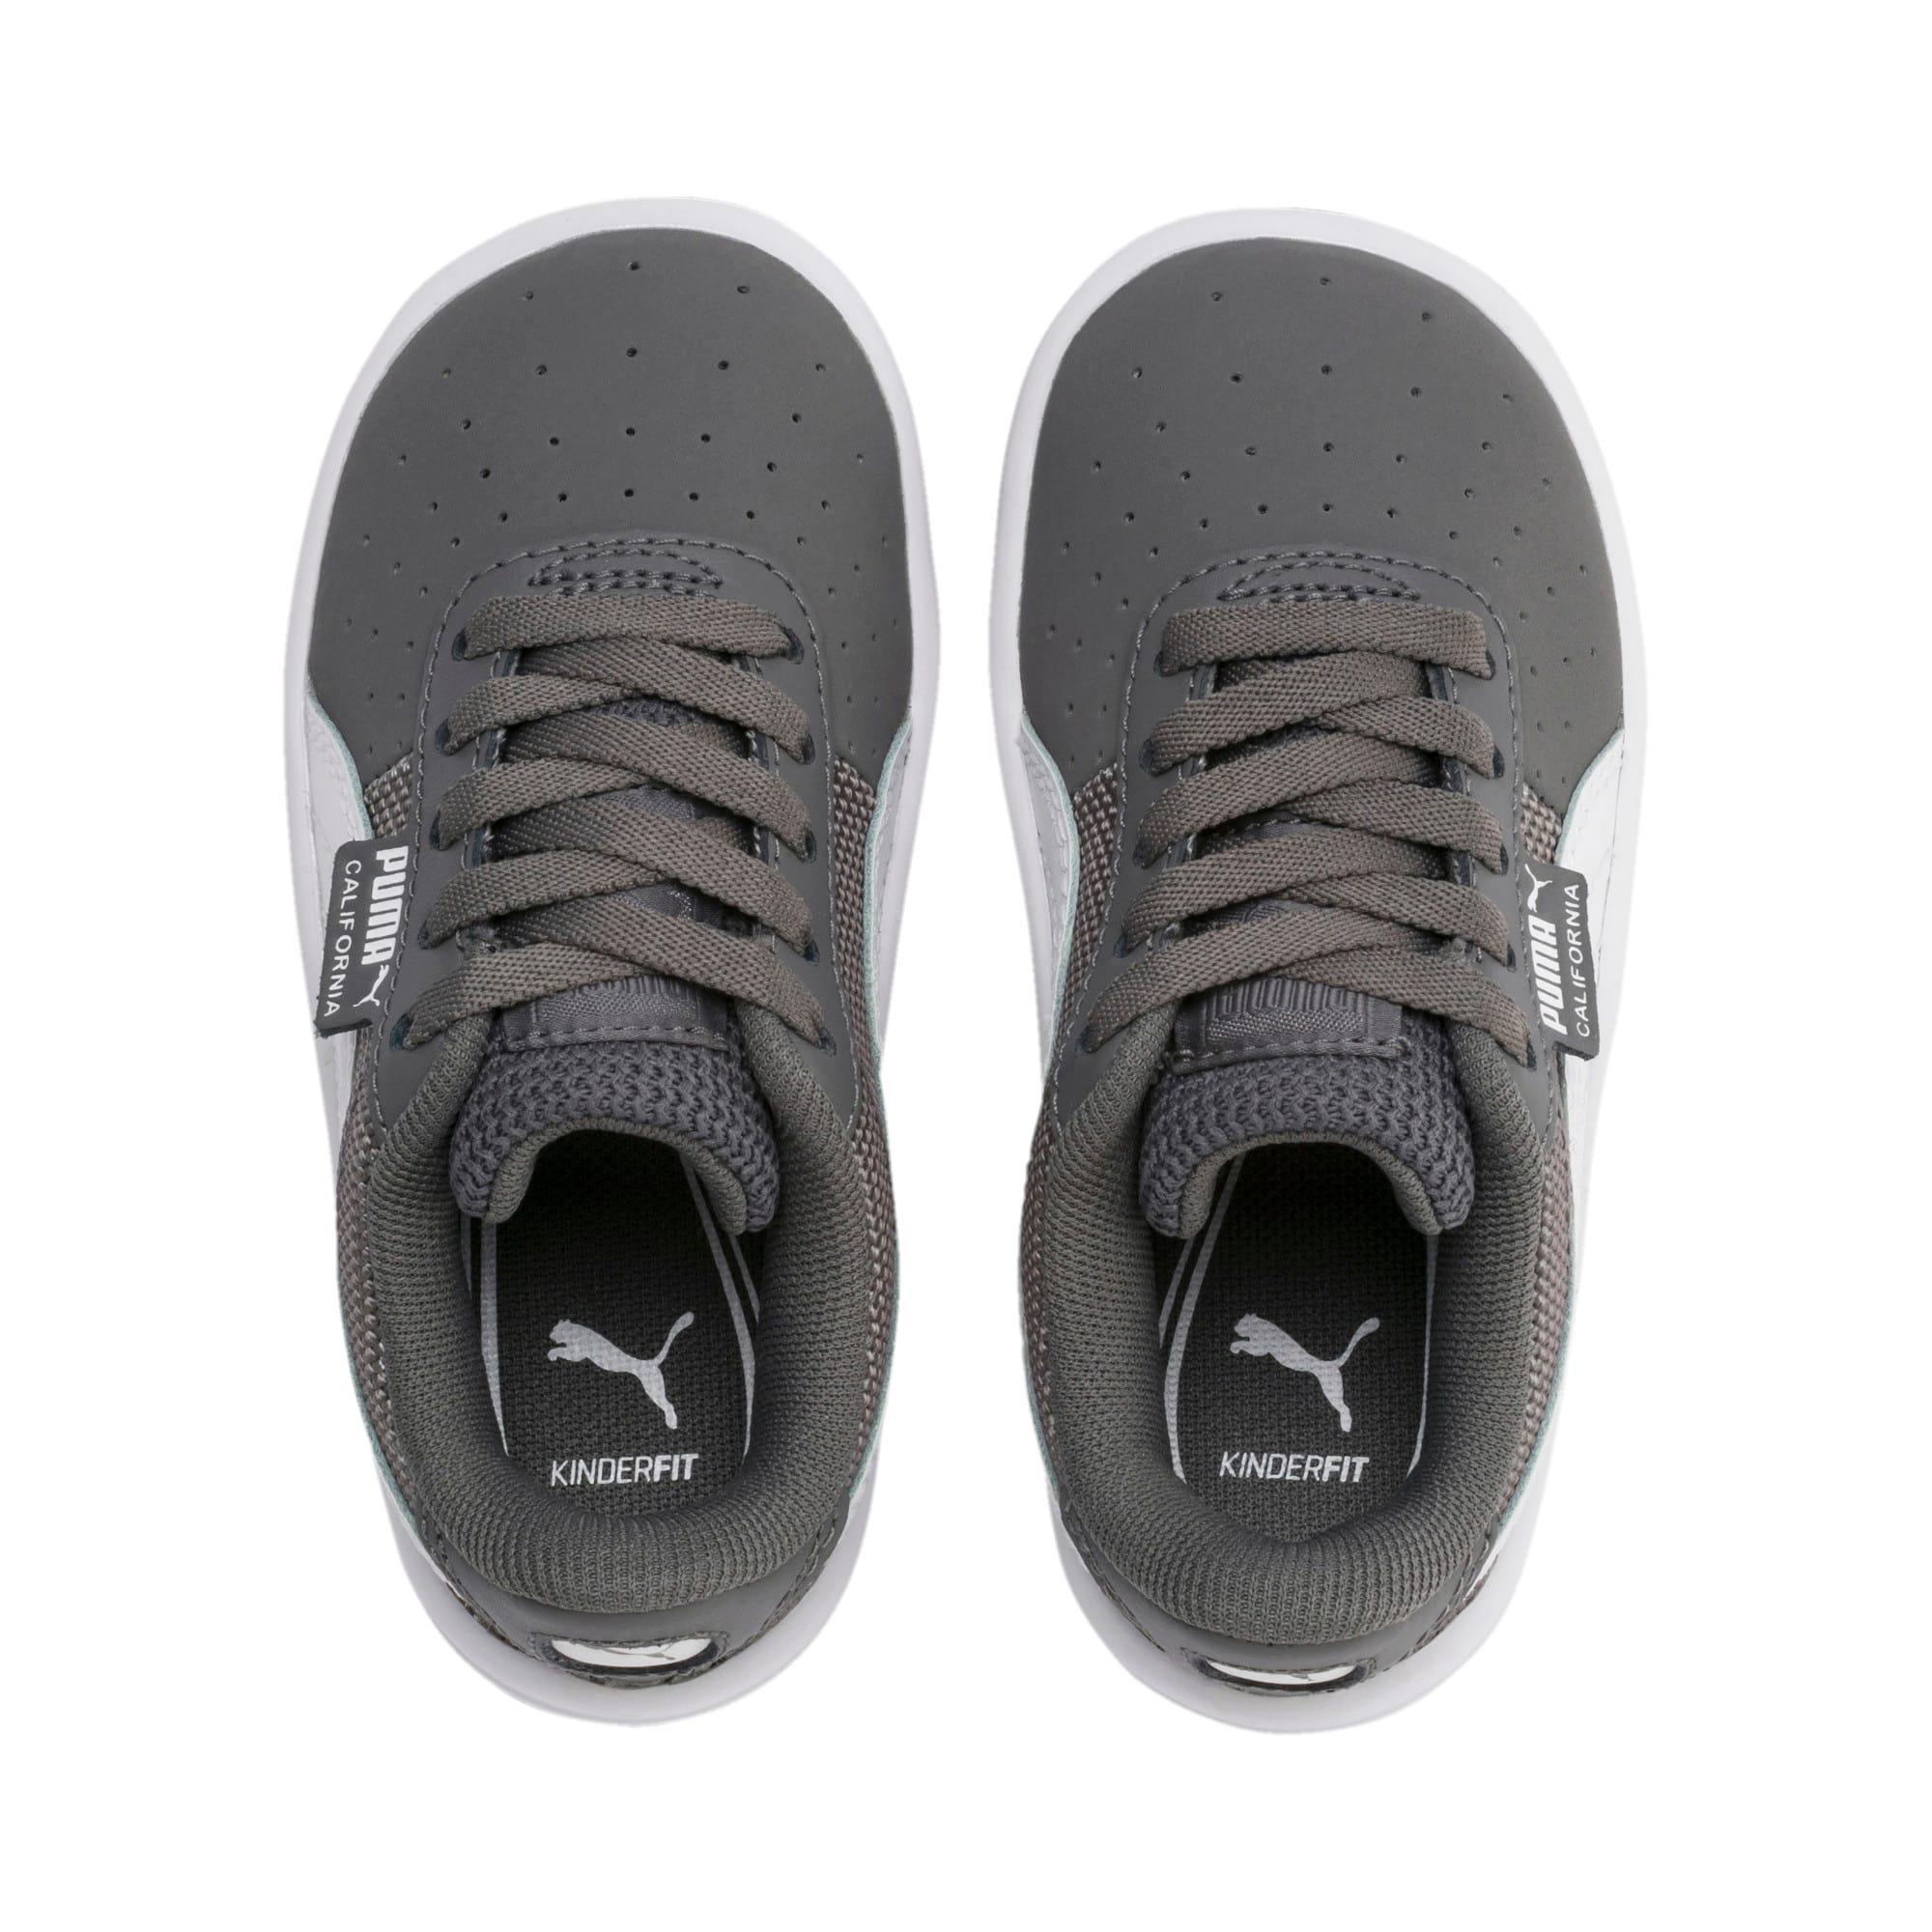 Thumbnail 6 of California Toddler Shoes, CASTLEROCK-Puma White, medium